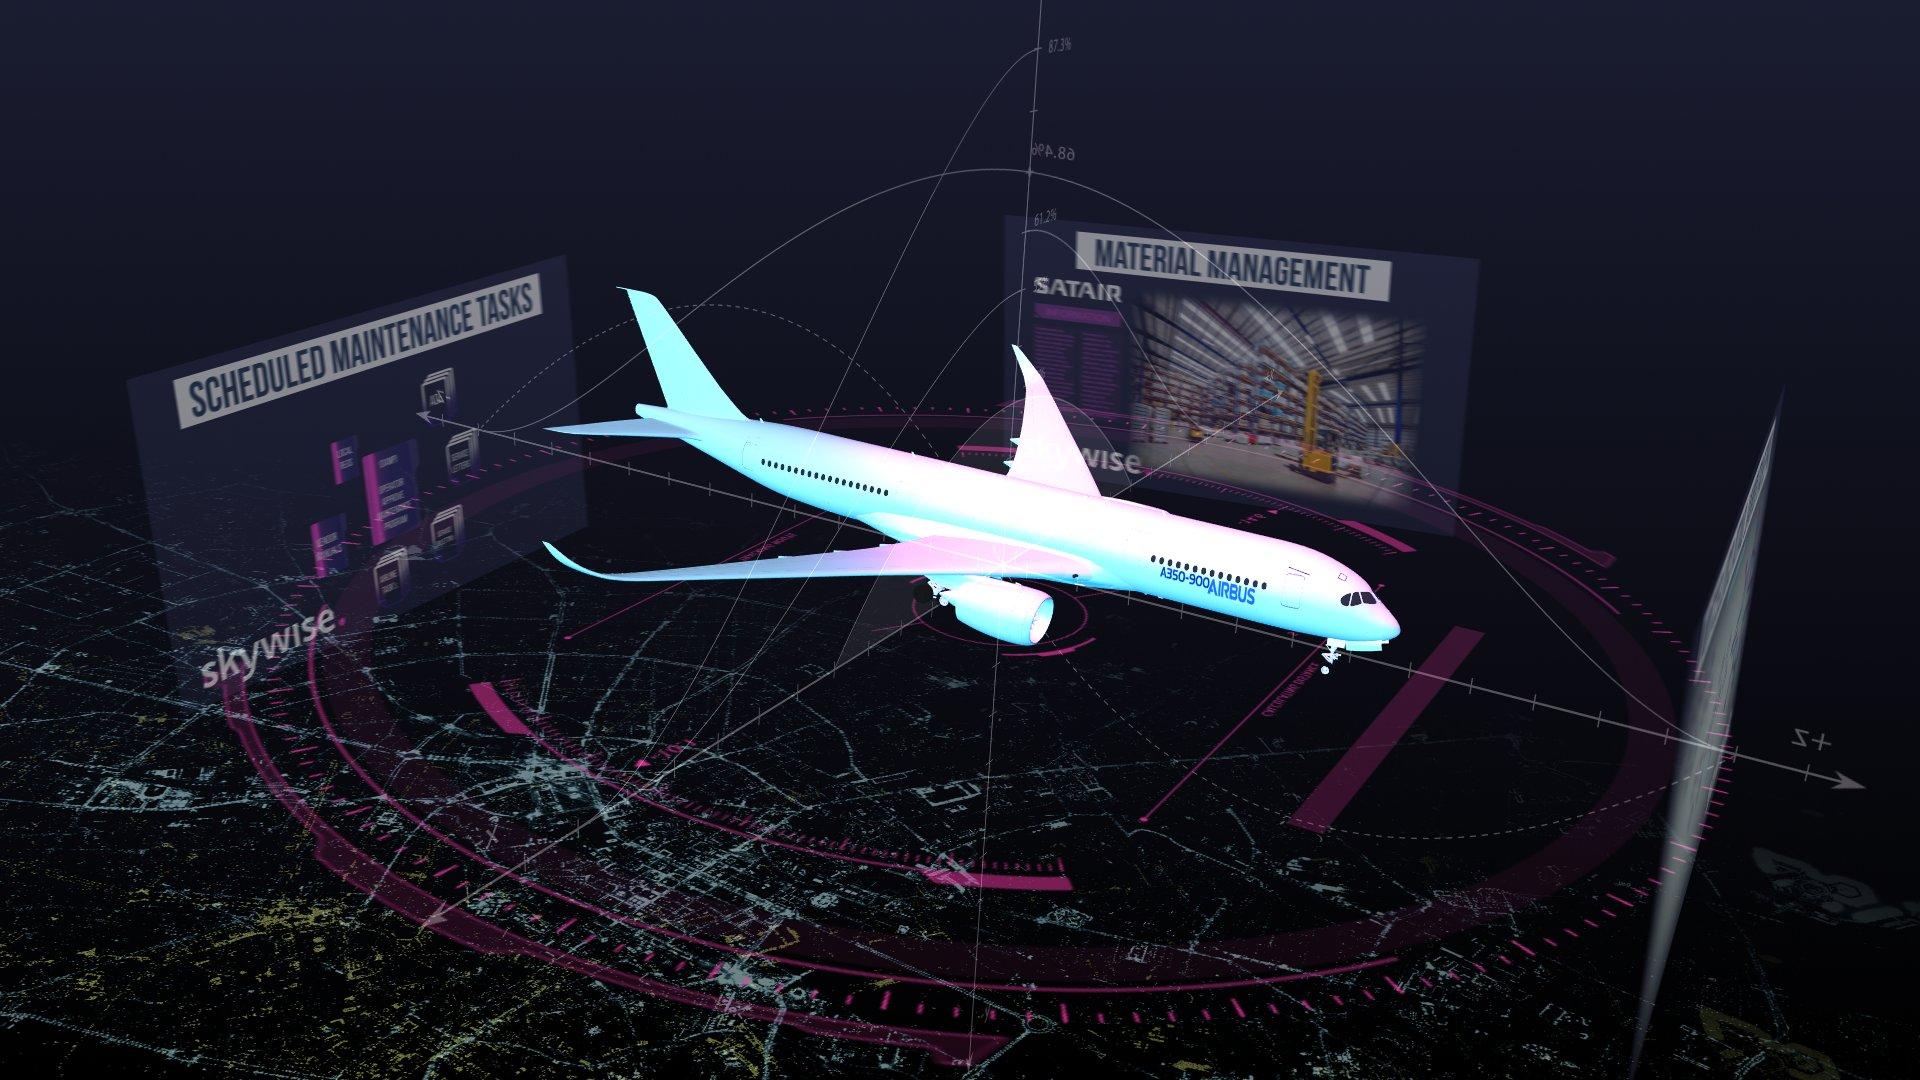 Hangar of the future